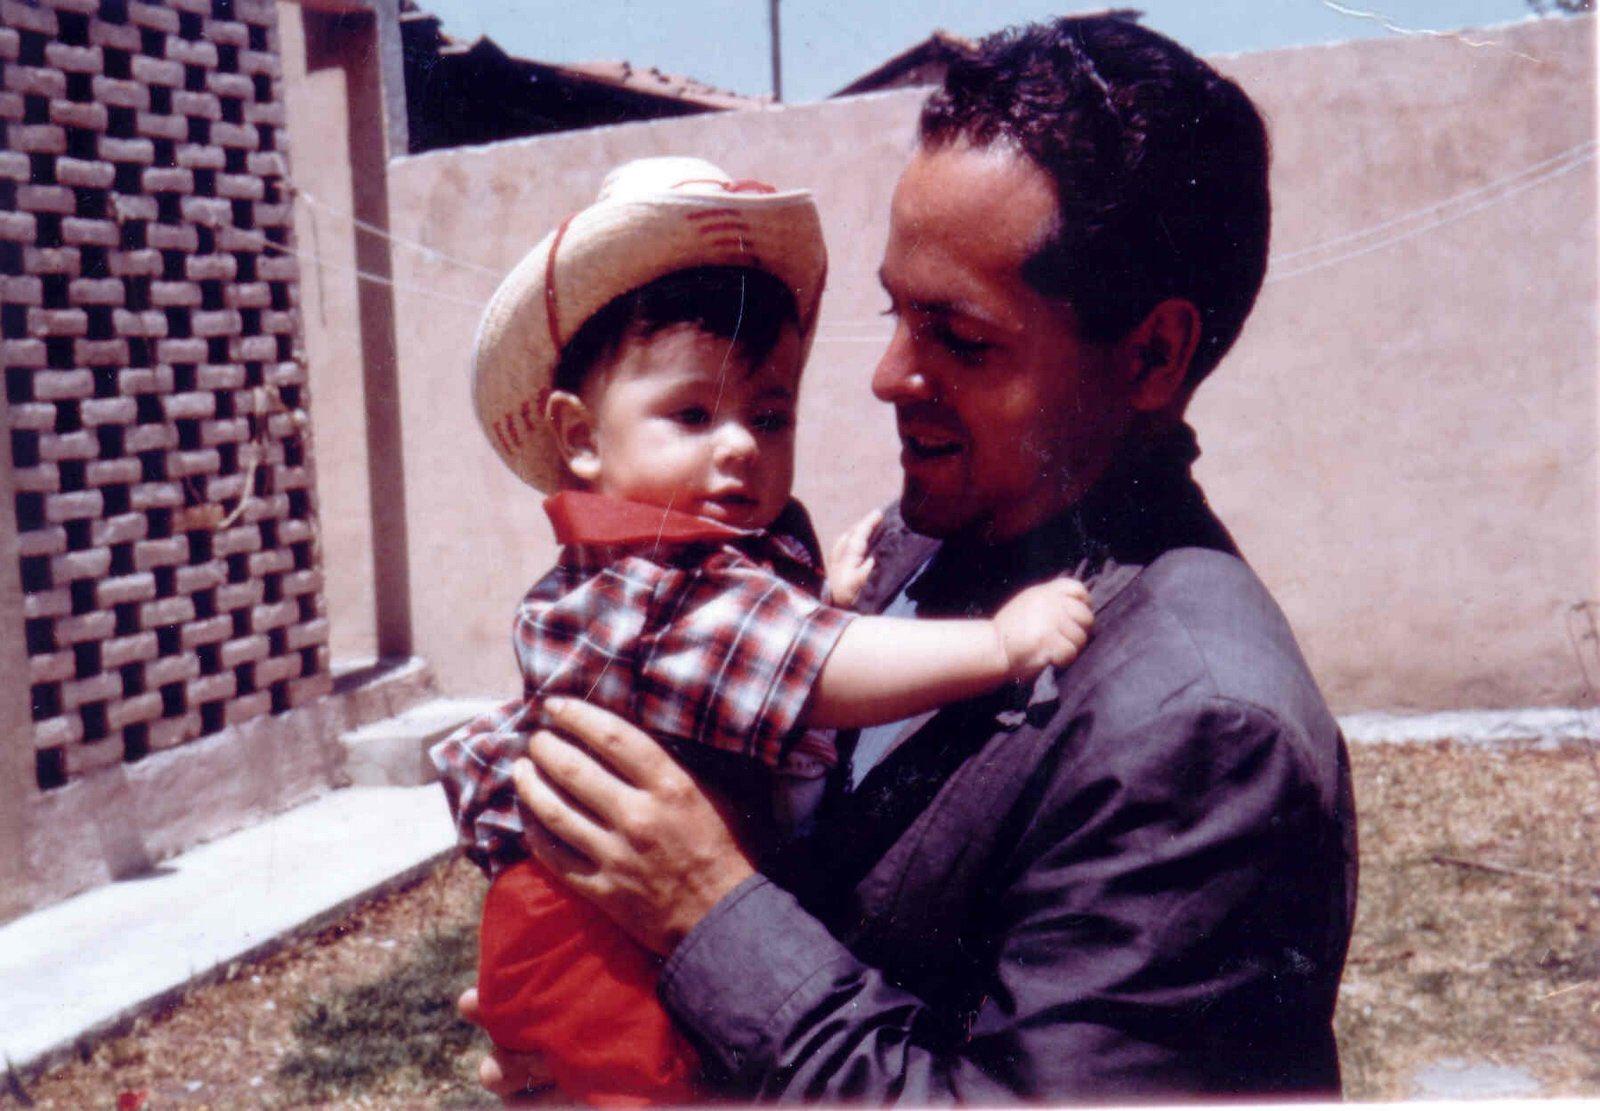 Te extraño todos los días. Te amo, papá. https://t.co/j8h3tnv6Wt